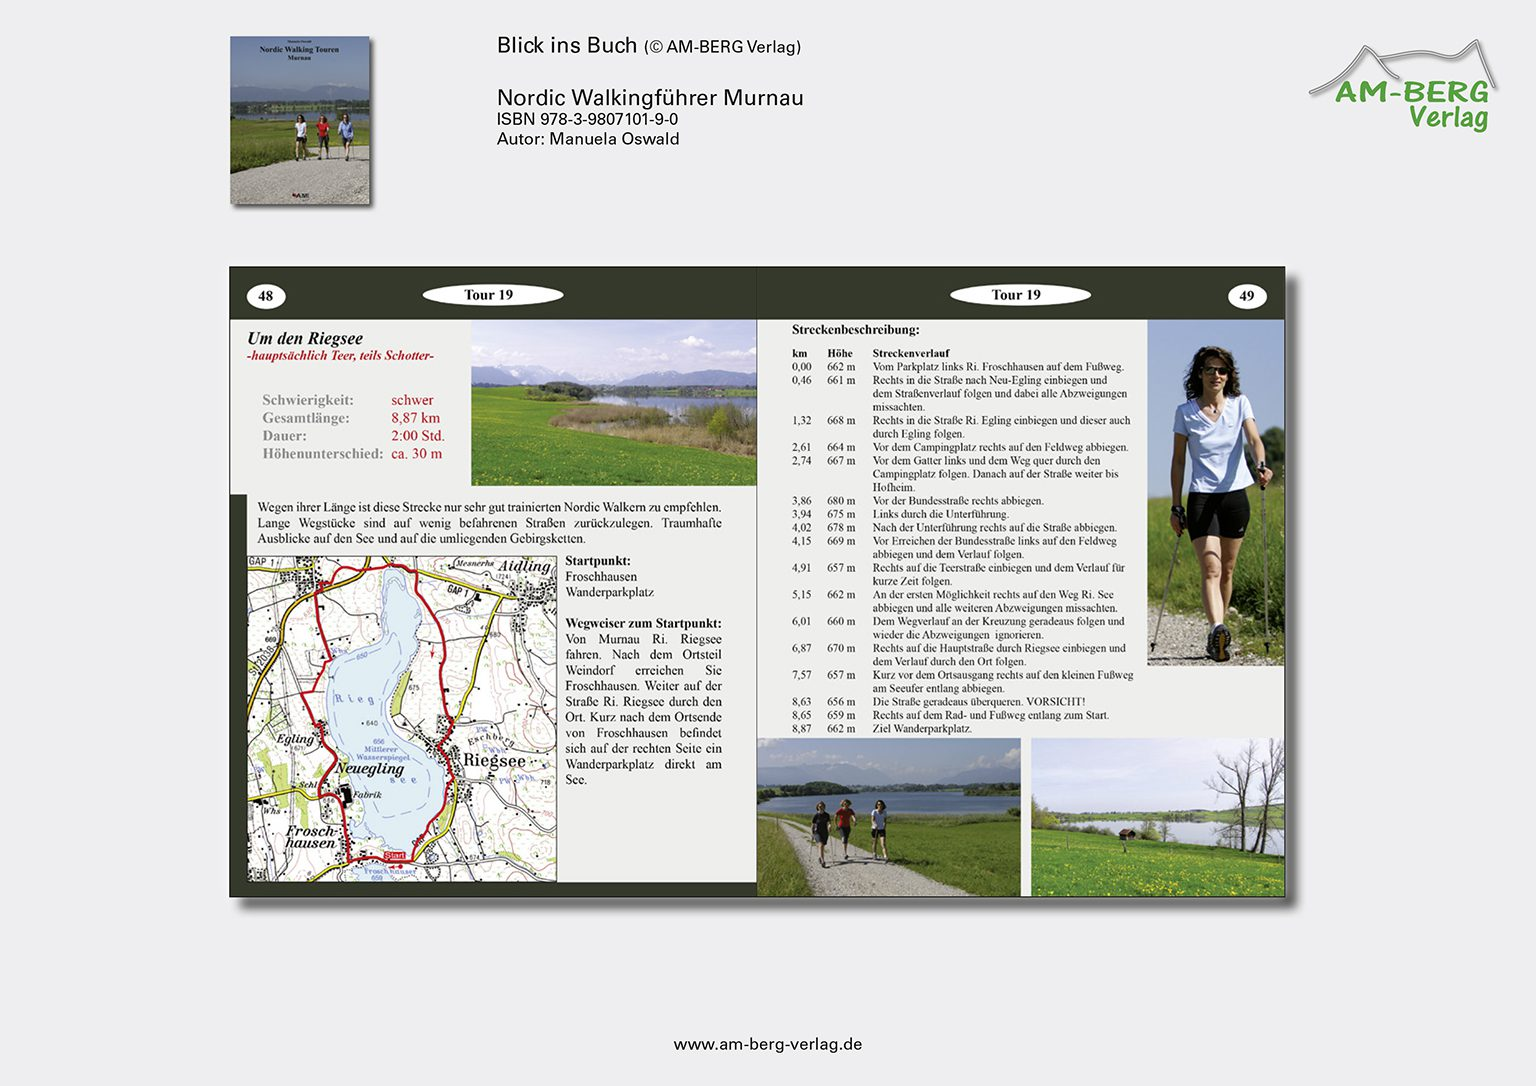 Nordic Walking Touren Murnau_BlickinsBuch_Um den Riegsee